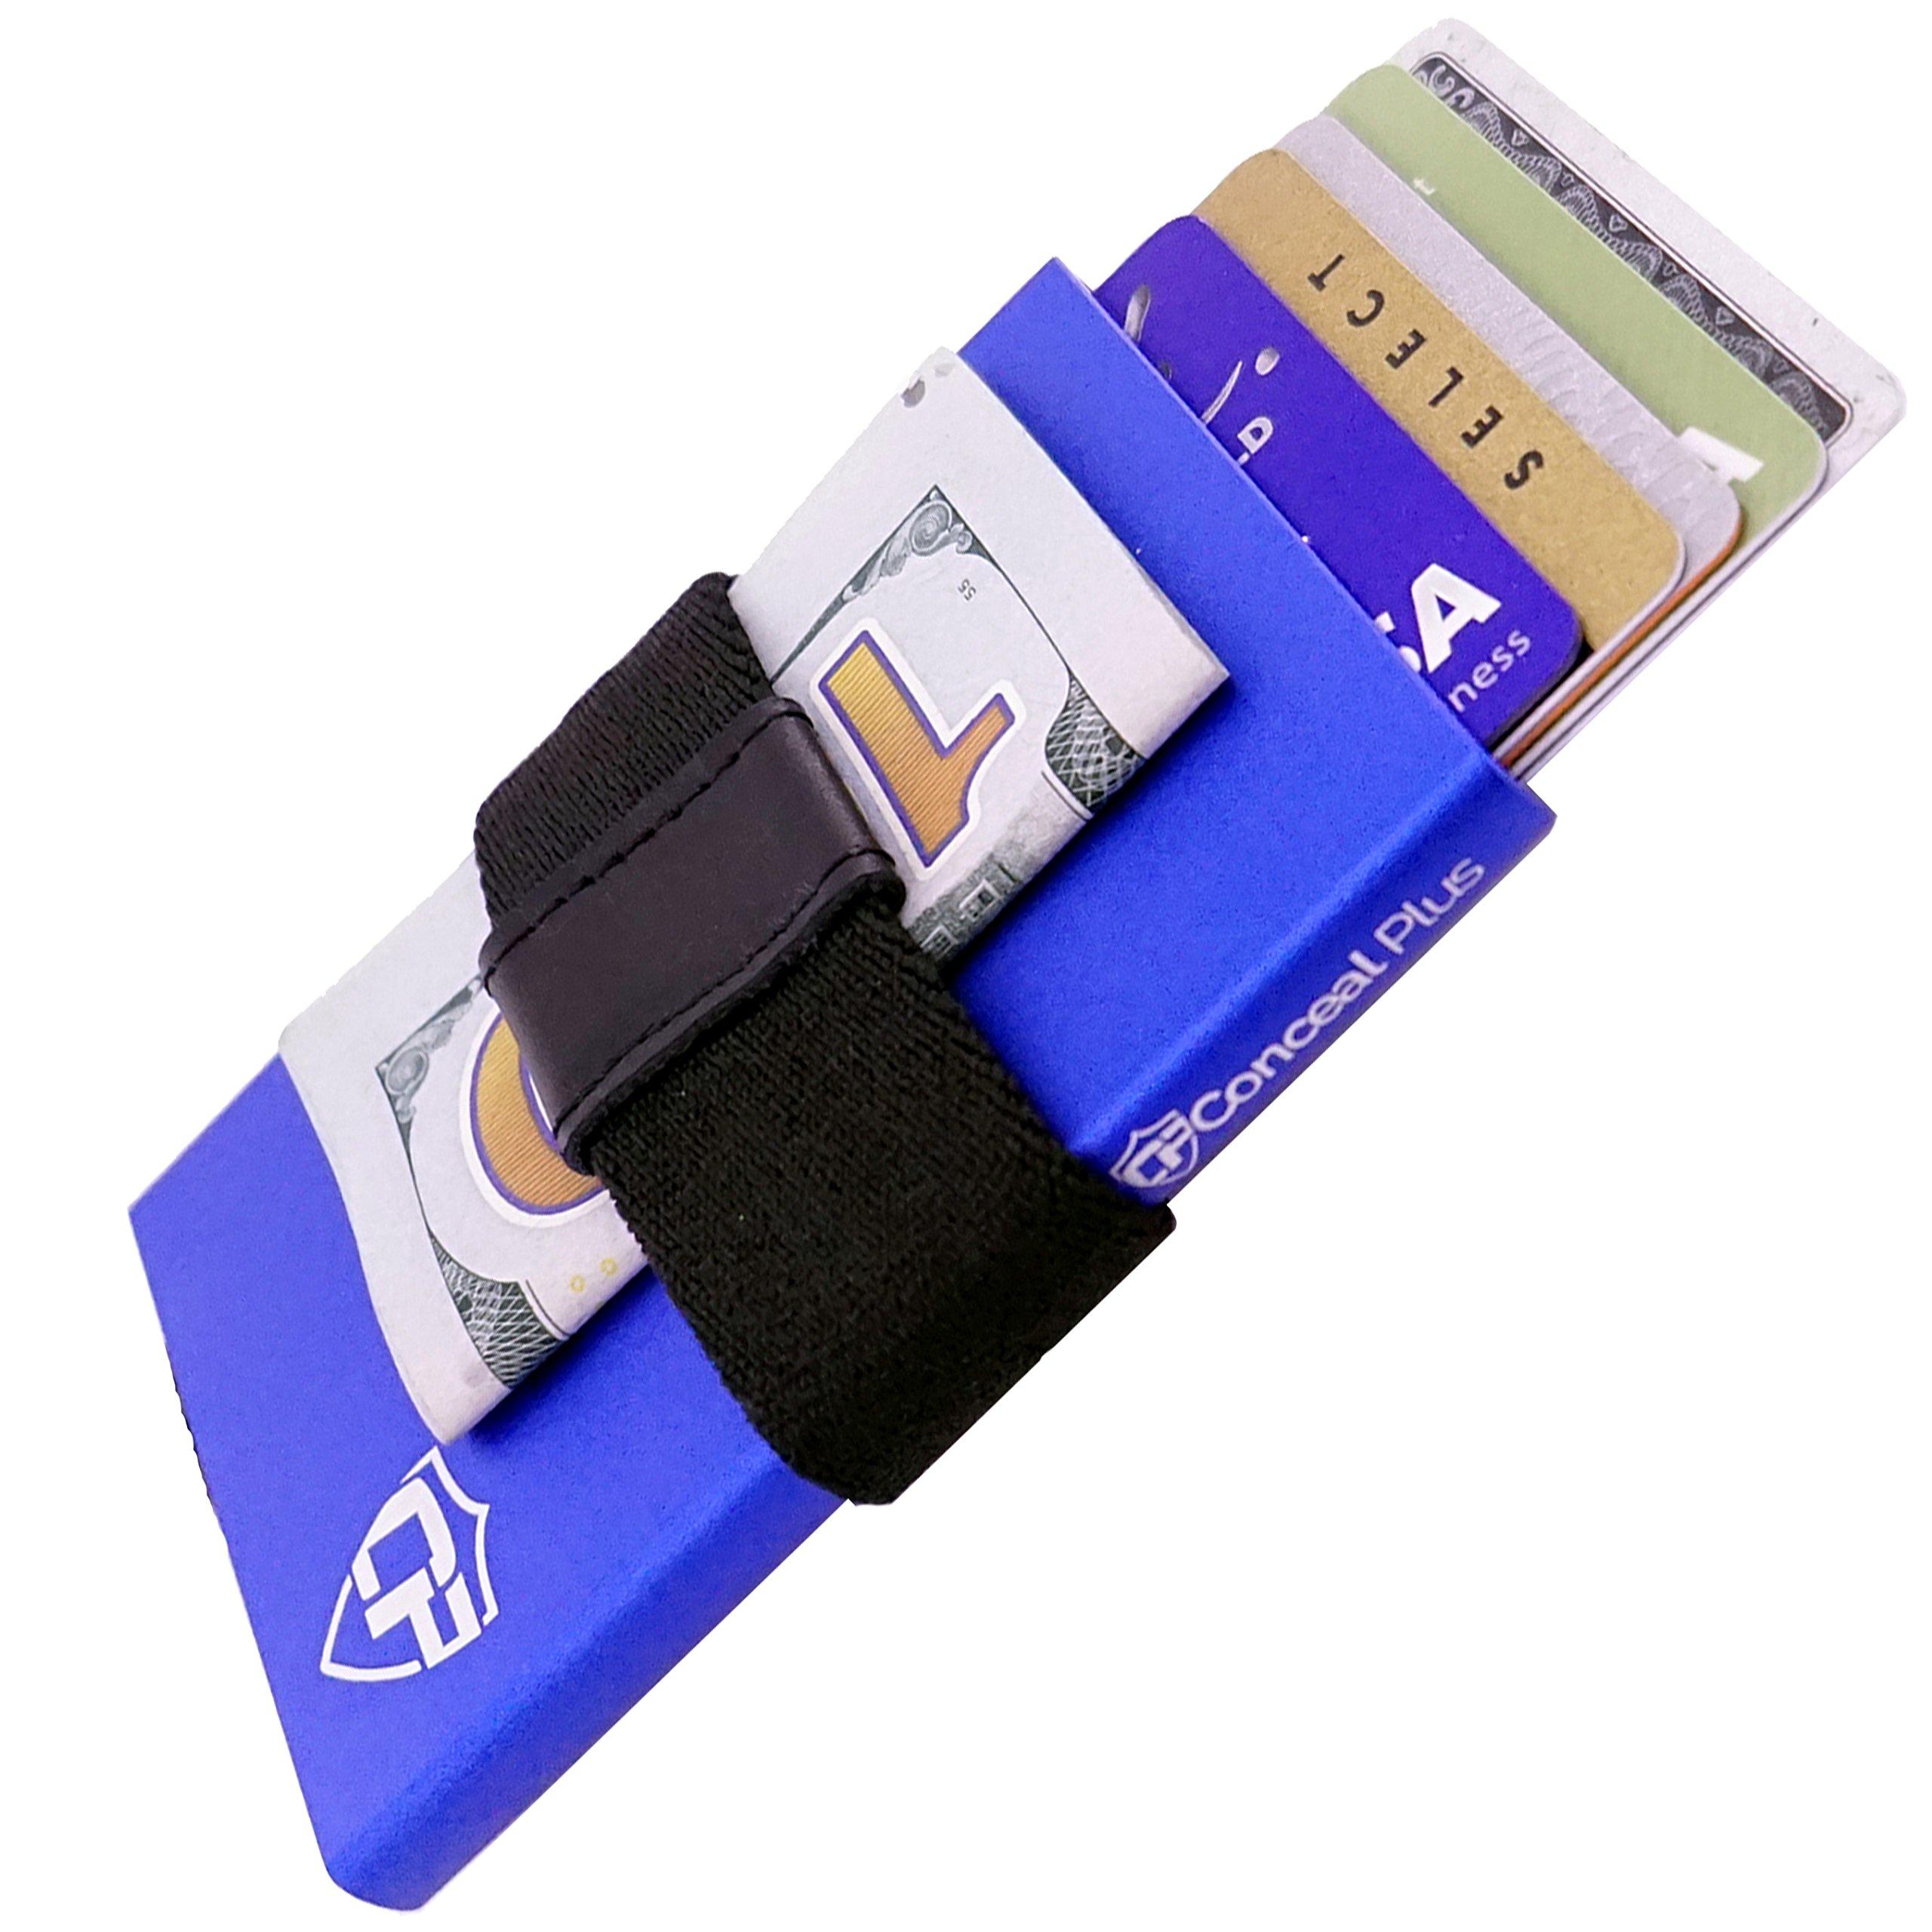 Card Blocr Money Clip Card Holder with Bottom Trigger   Best Minimalist Wallet 2018   RFID Blocking (Blue)